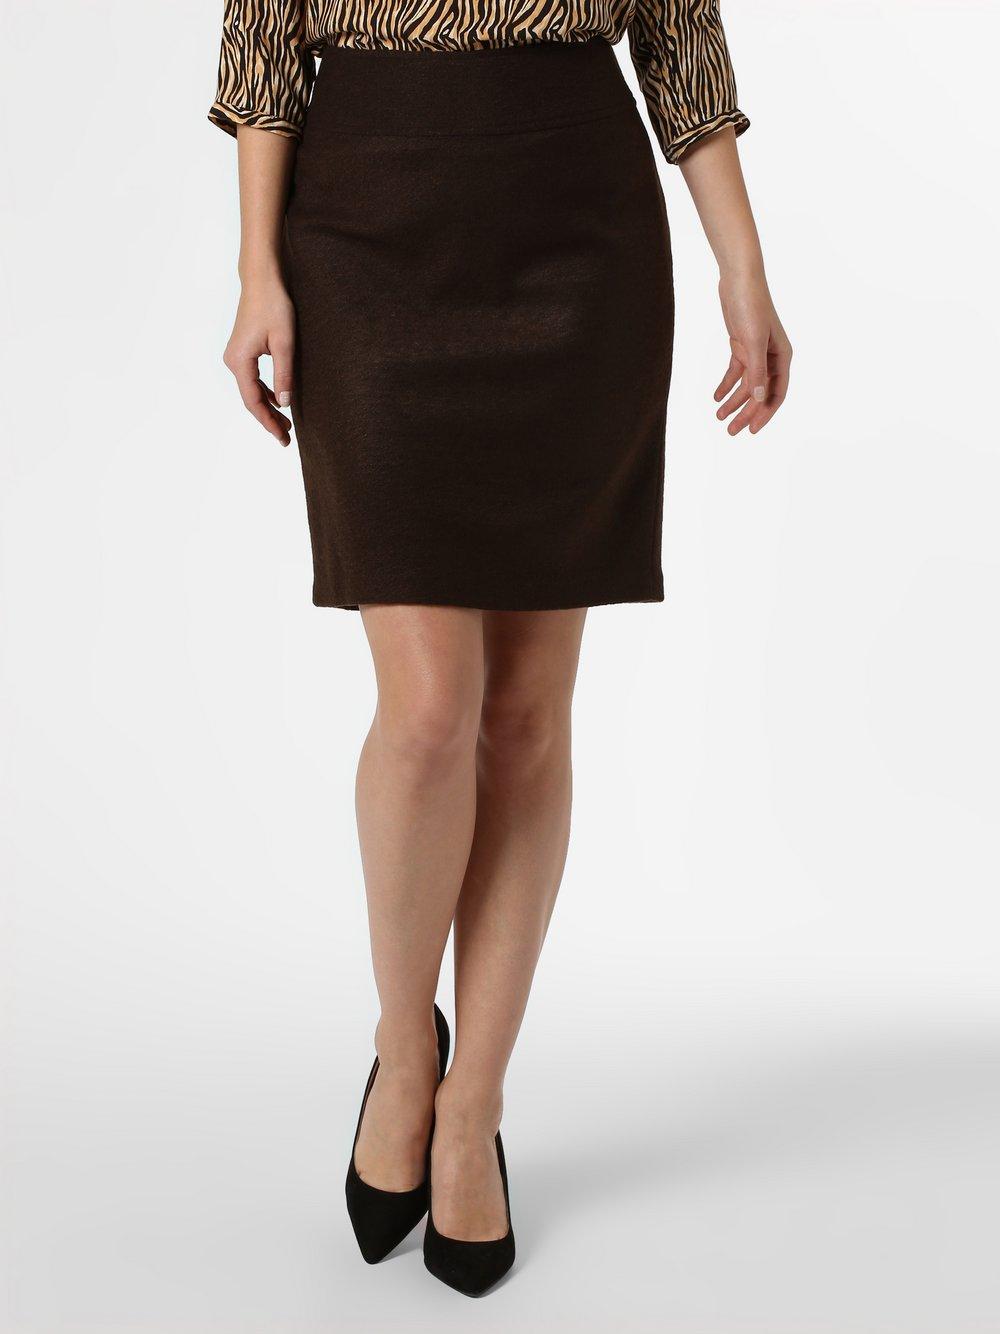 Franco Callegari - Spódnica damska, brązowy